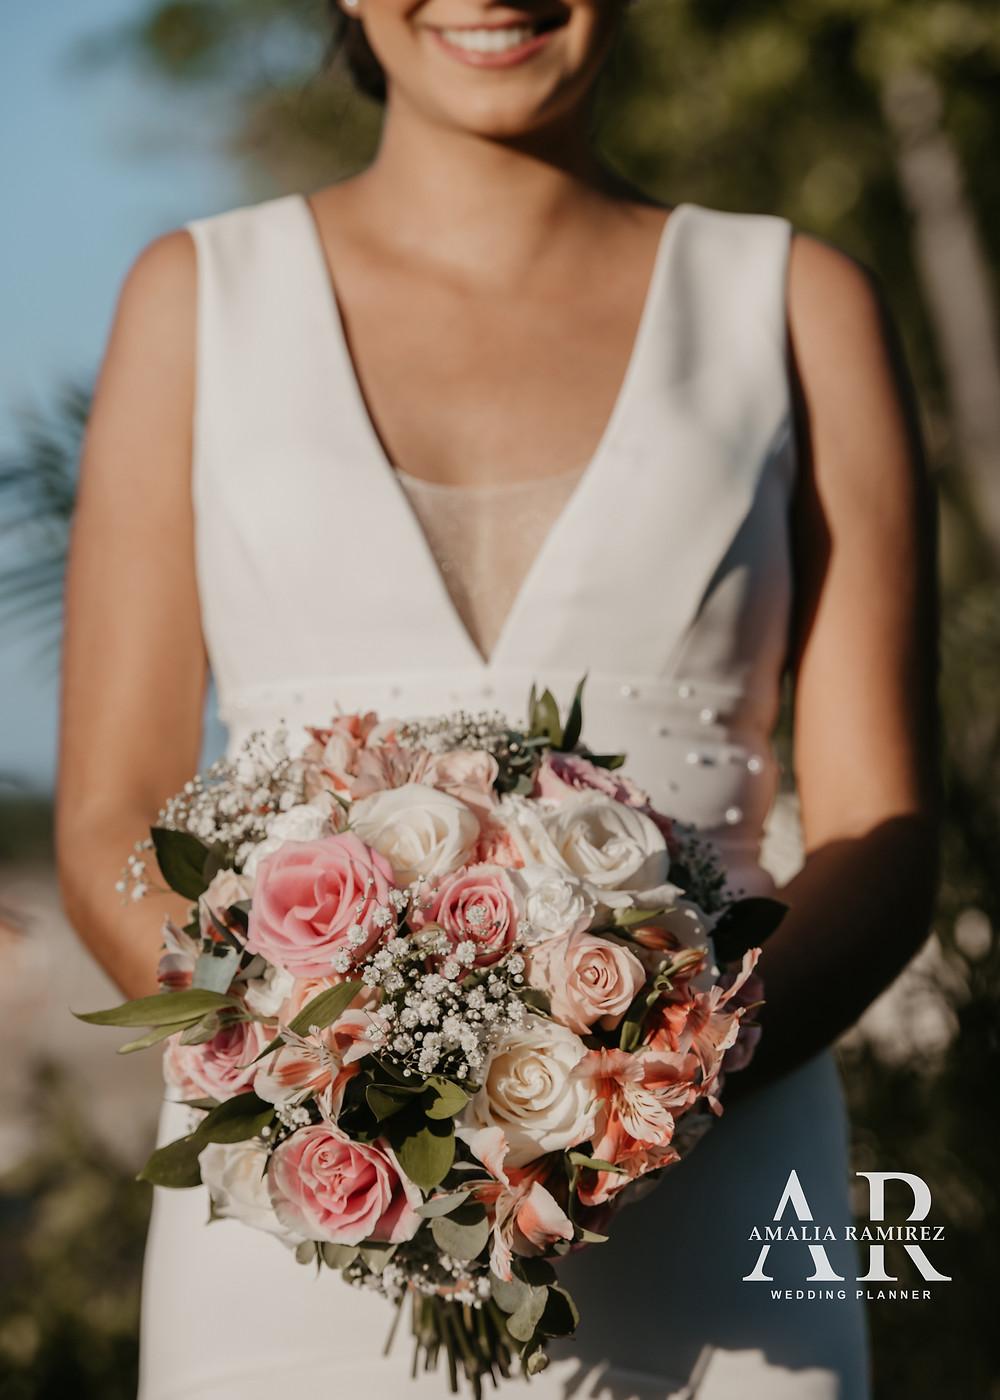 Amalia Ramirez Wedding Planner